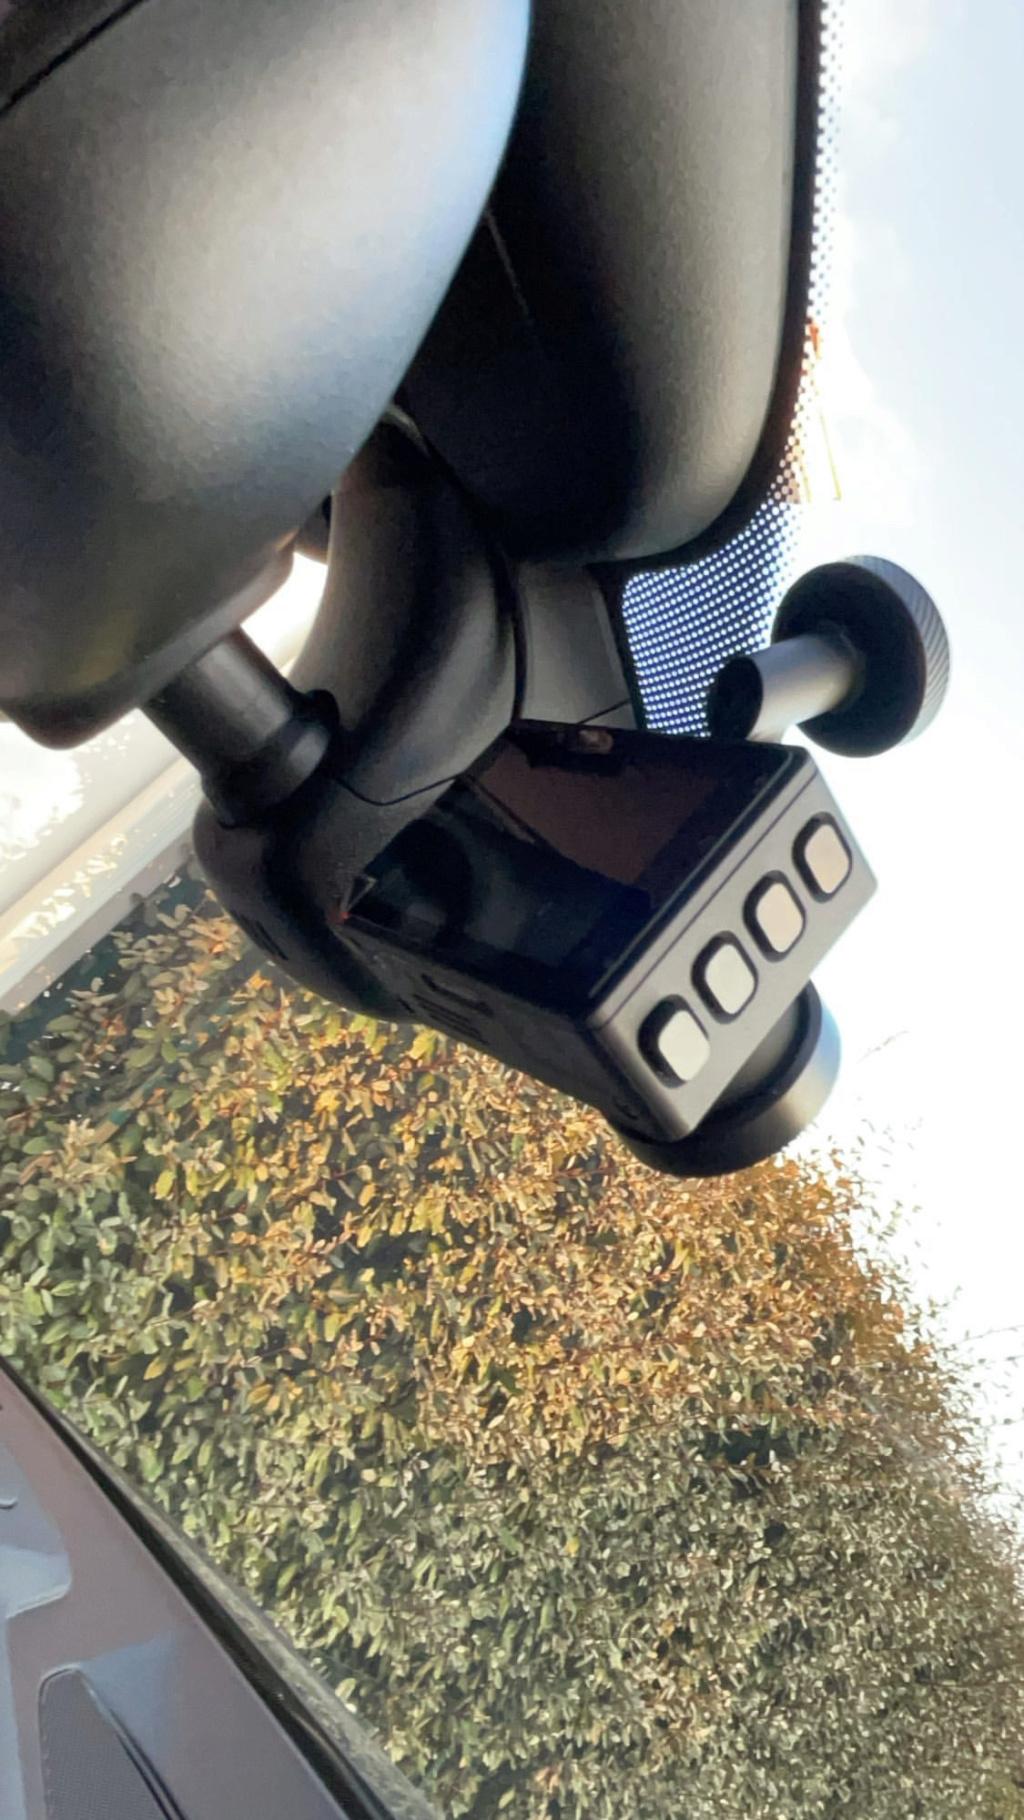 Tomsuits - Audi TT 230 Quattro - Daytona Grey - Alcantara 9c17ad10